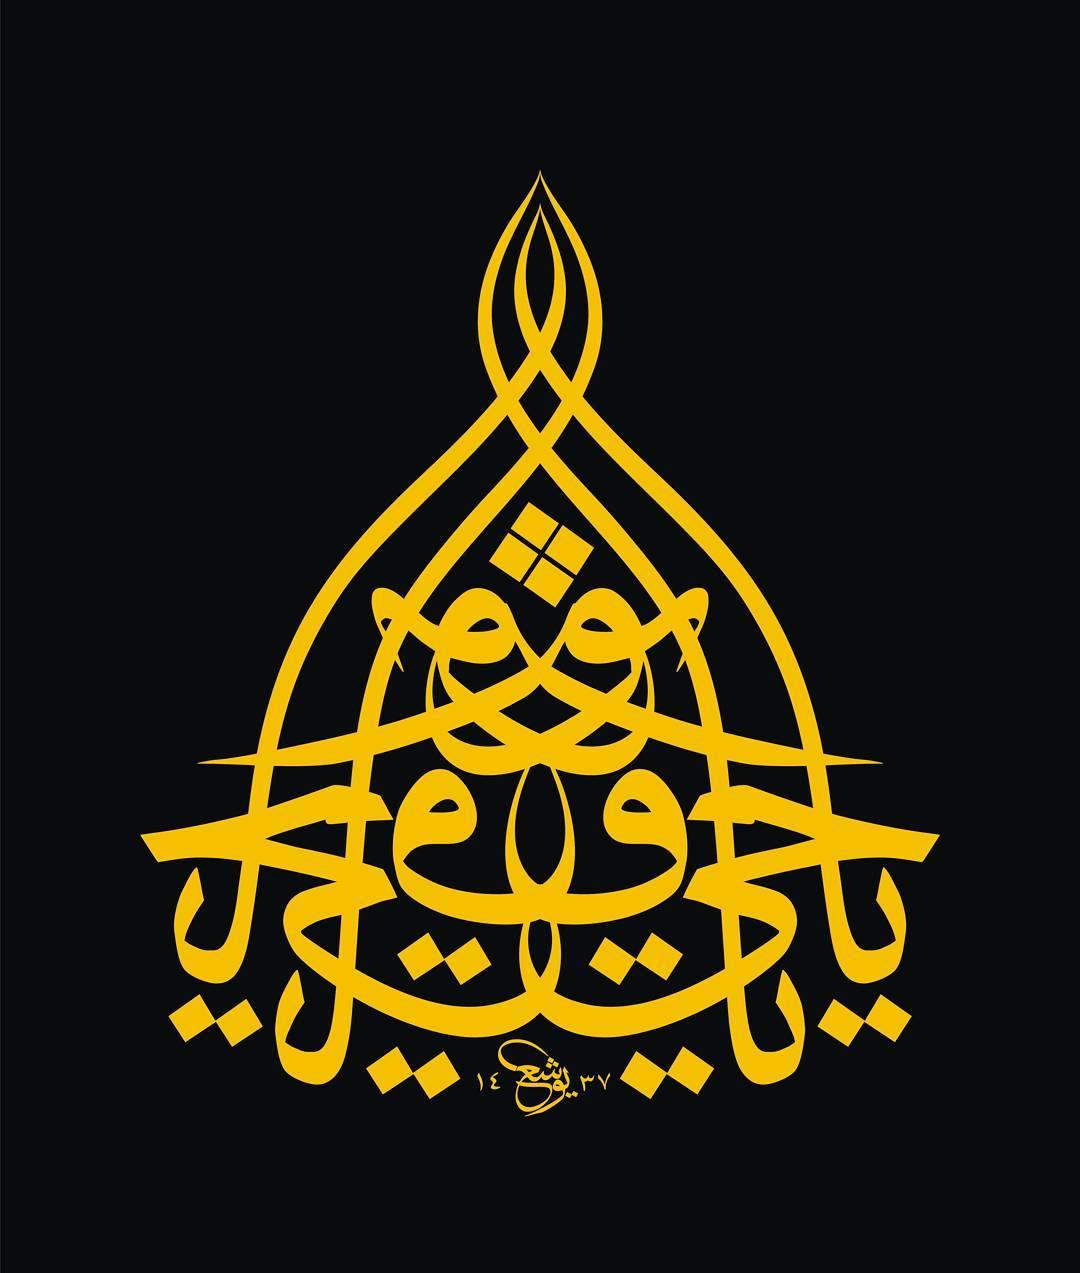 Donwload Photo Khat Unik يا حي يا قيوم  Ya Hayyu Ya Qayyum Calligraphy: Yushaa Abdullah… – Yushaa Abdullah